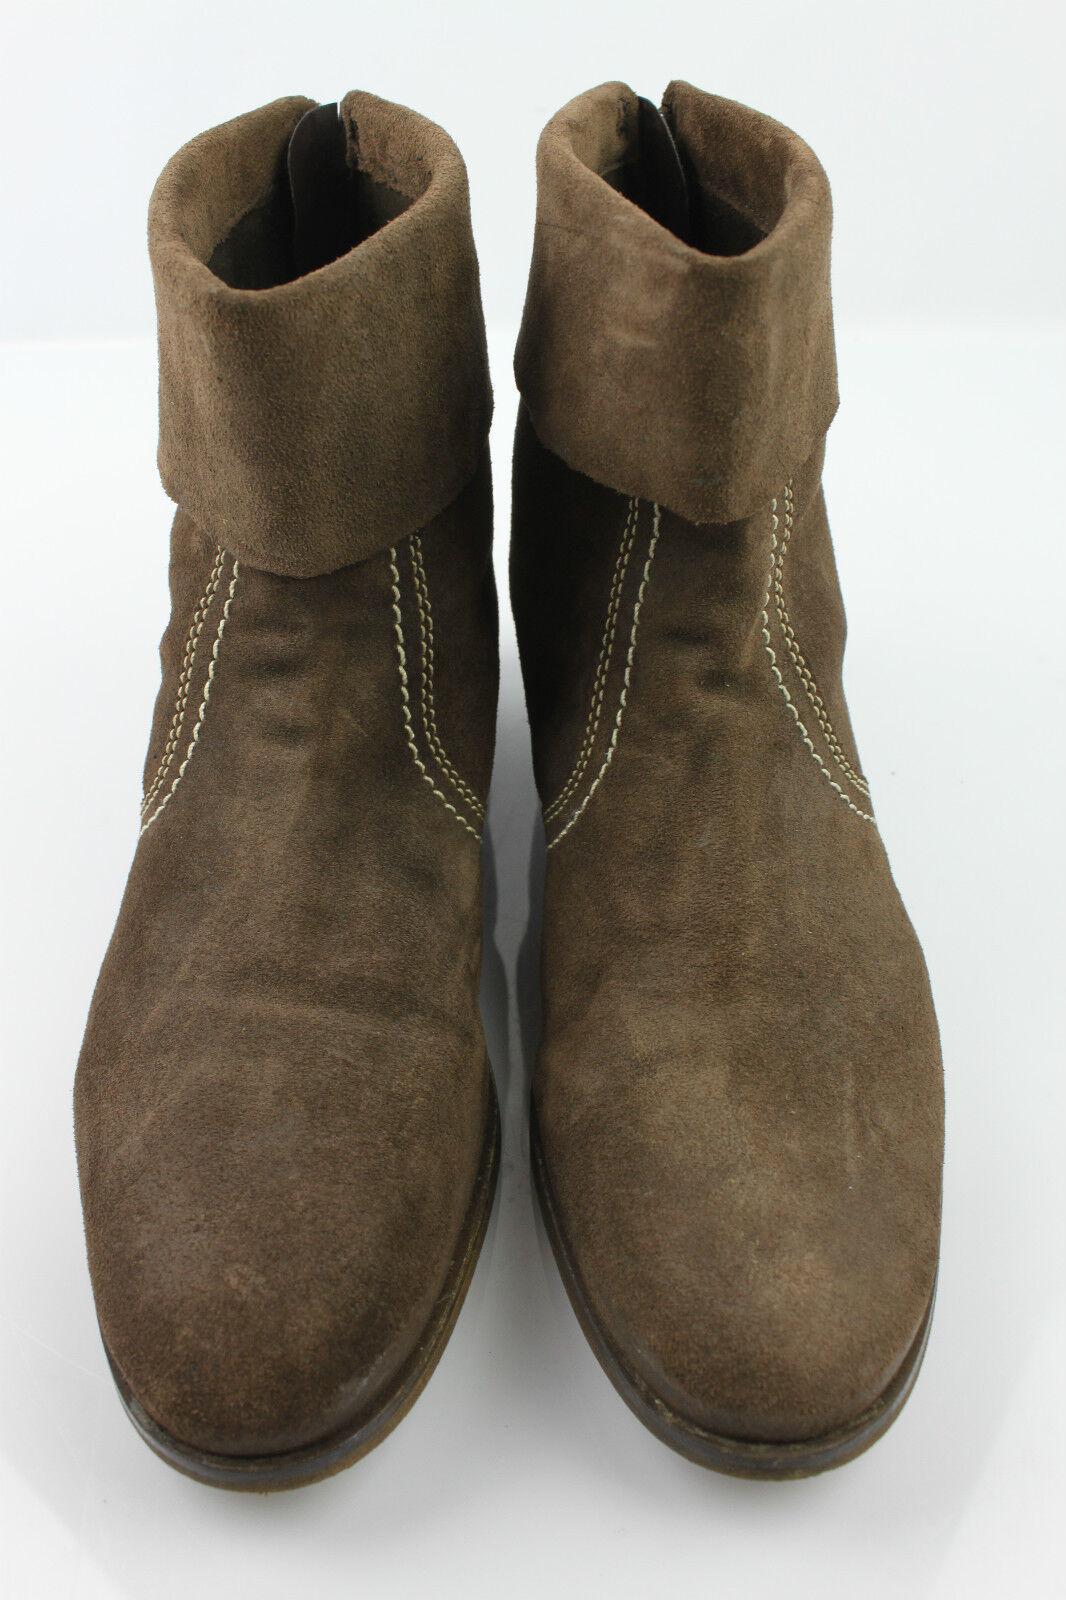 Stiefel Stiefeletten CASUAL Wildleder Taupe T 40 top Zustand     a3f792